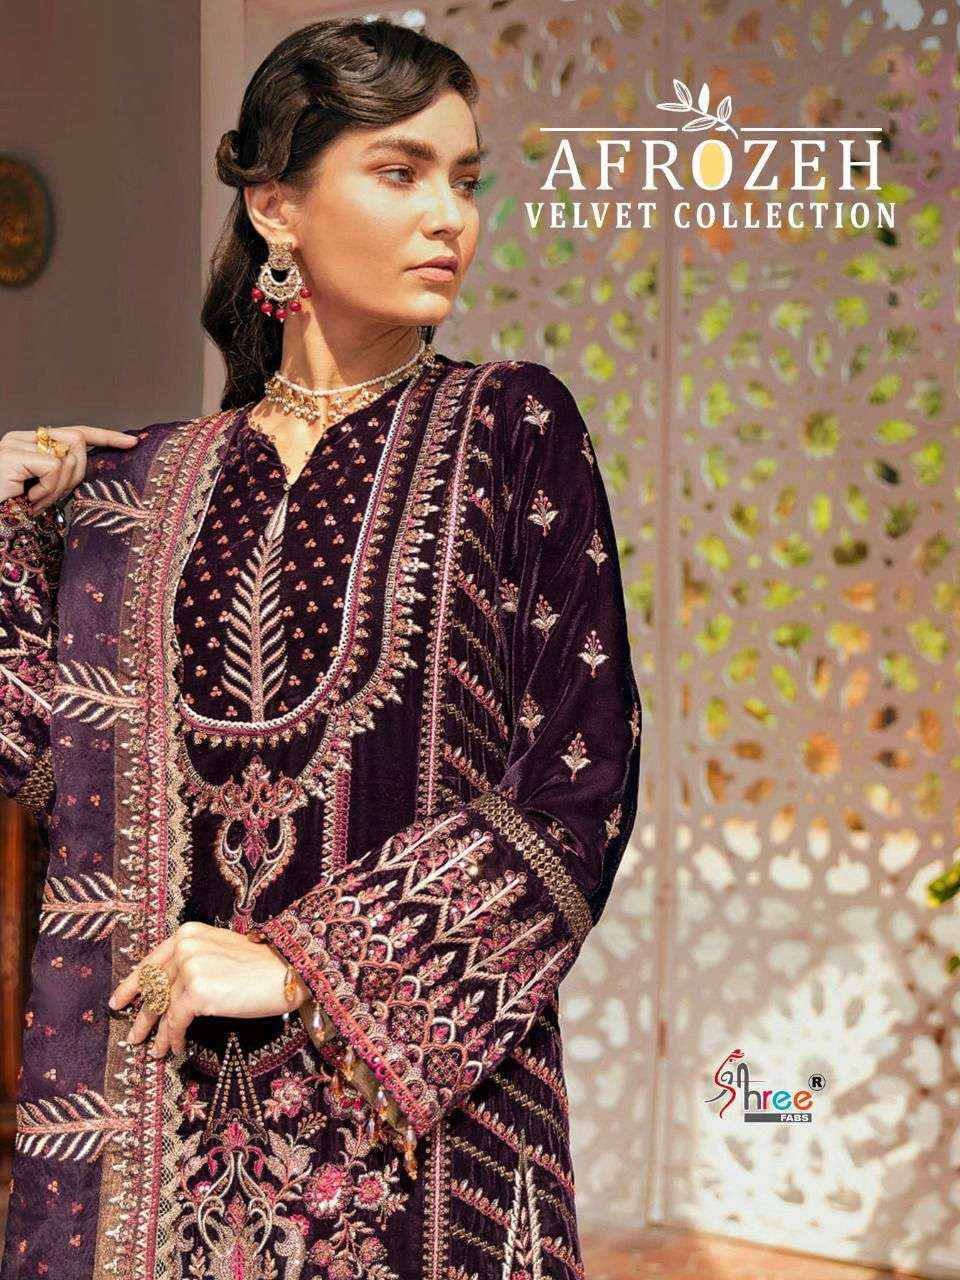 shree Fab Afrozeh Velvet collection Pakistani Pashmina suits Collection